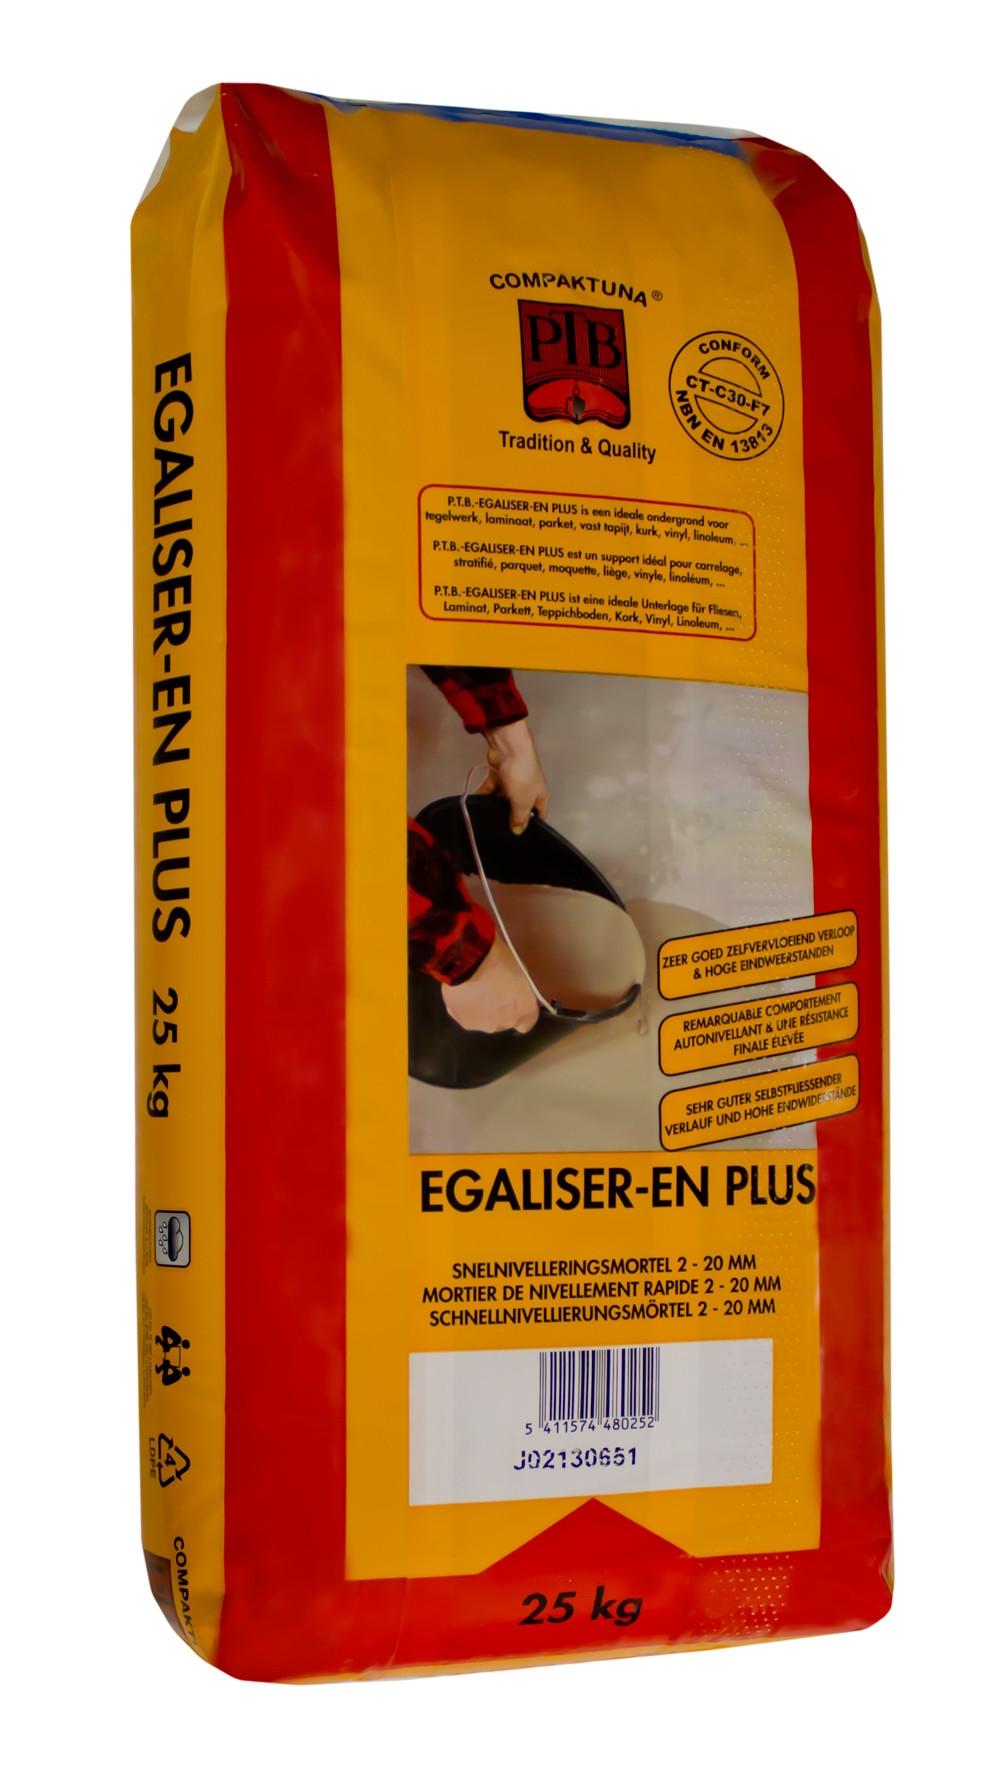 Egaliser-en Plus - 25kg - Bruingrijs